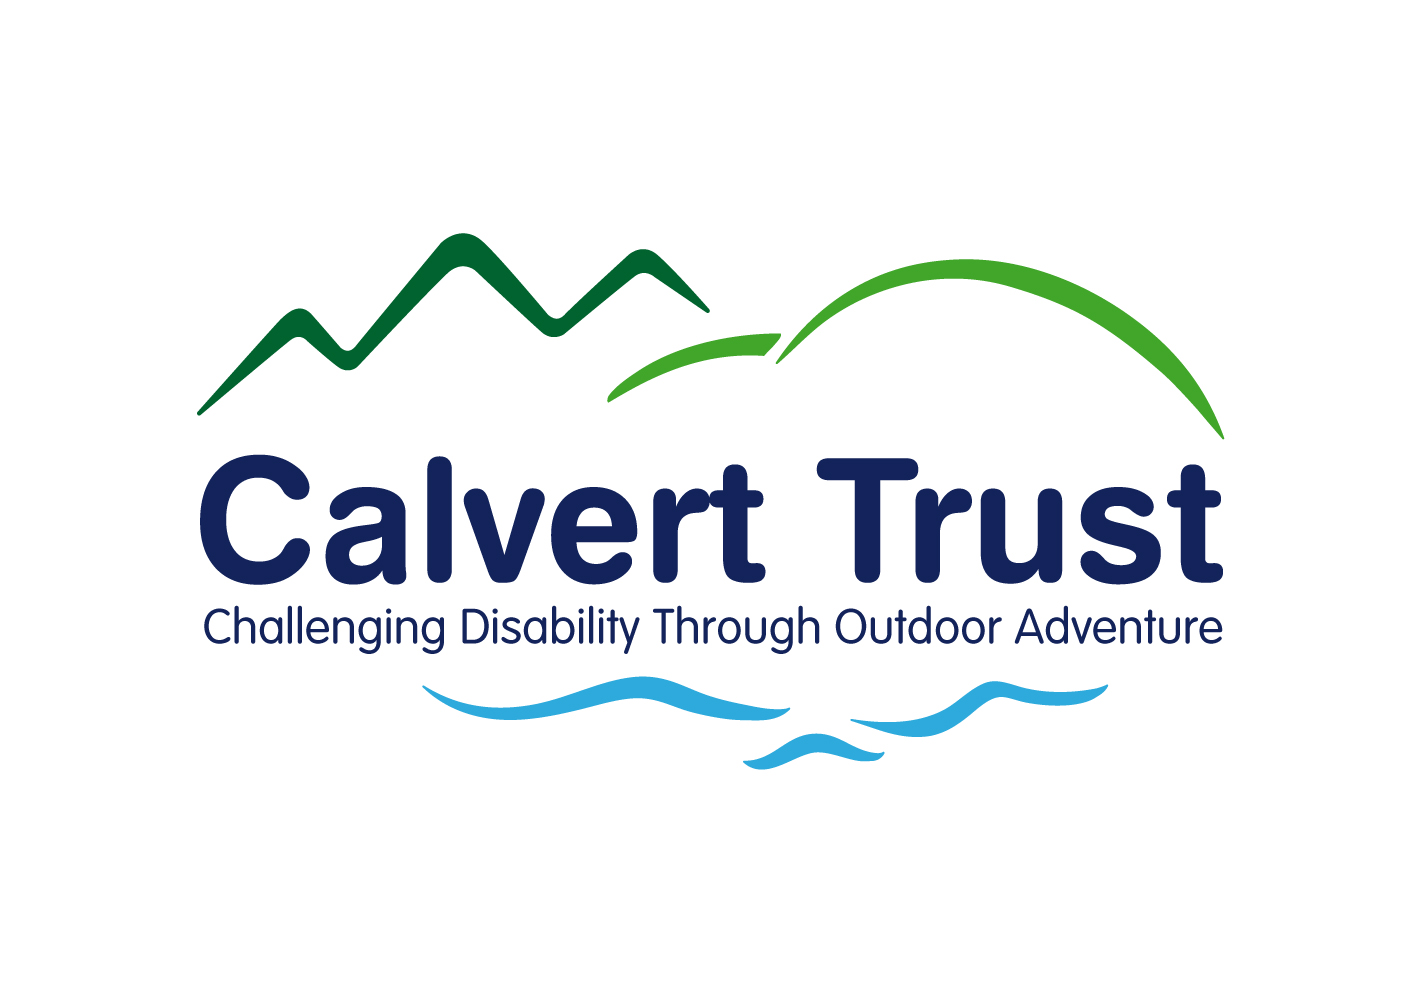 Copy of Calvert Trust